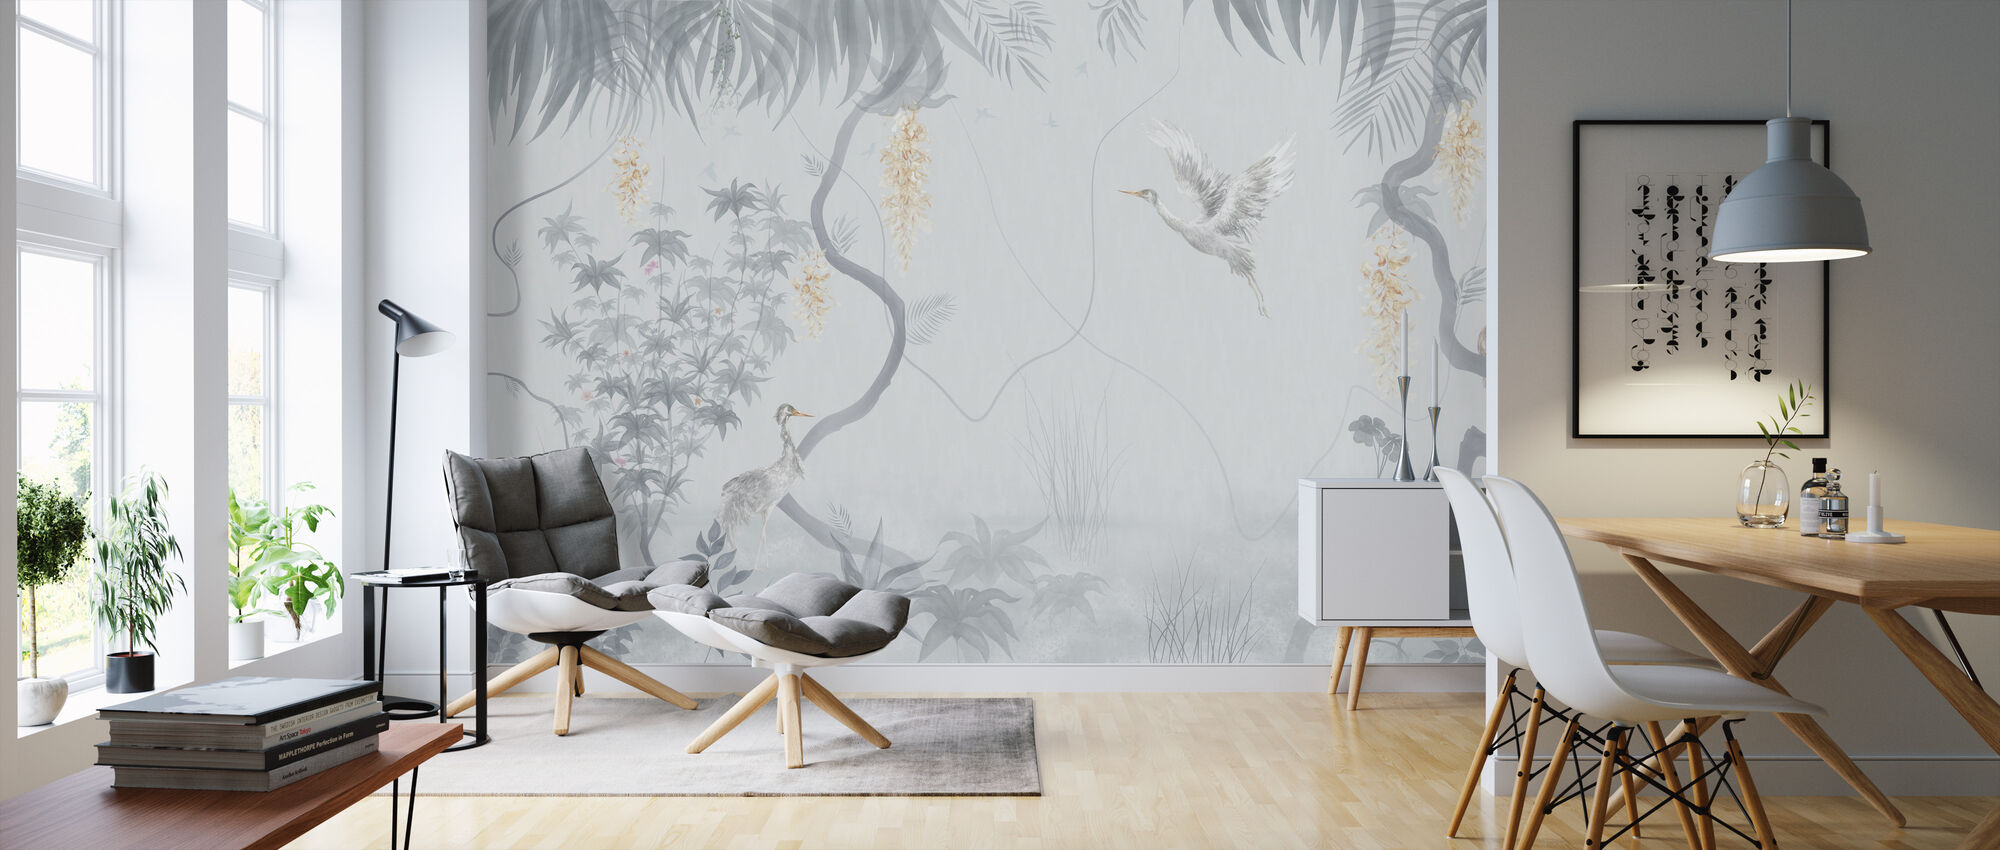 Tranquil Scenery - Ash Blue - Wallpaper - Living Room